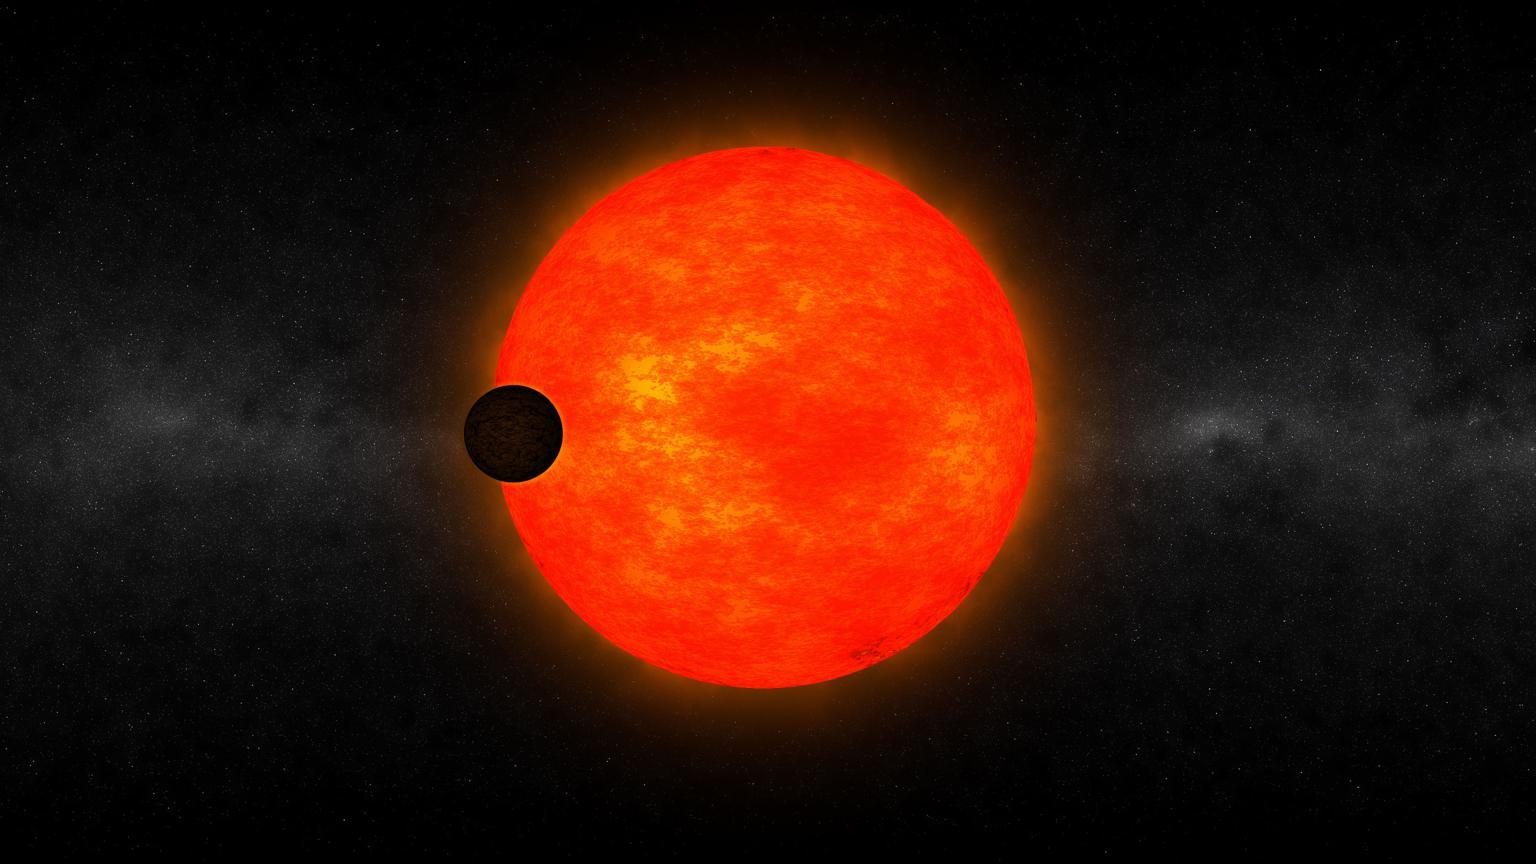 exoplanet landscape orbiting giant planet - photo #22